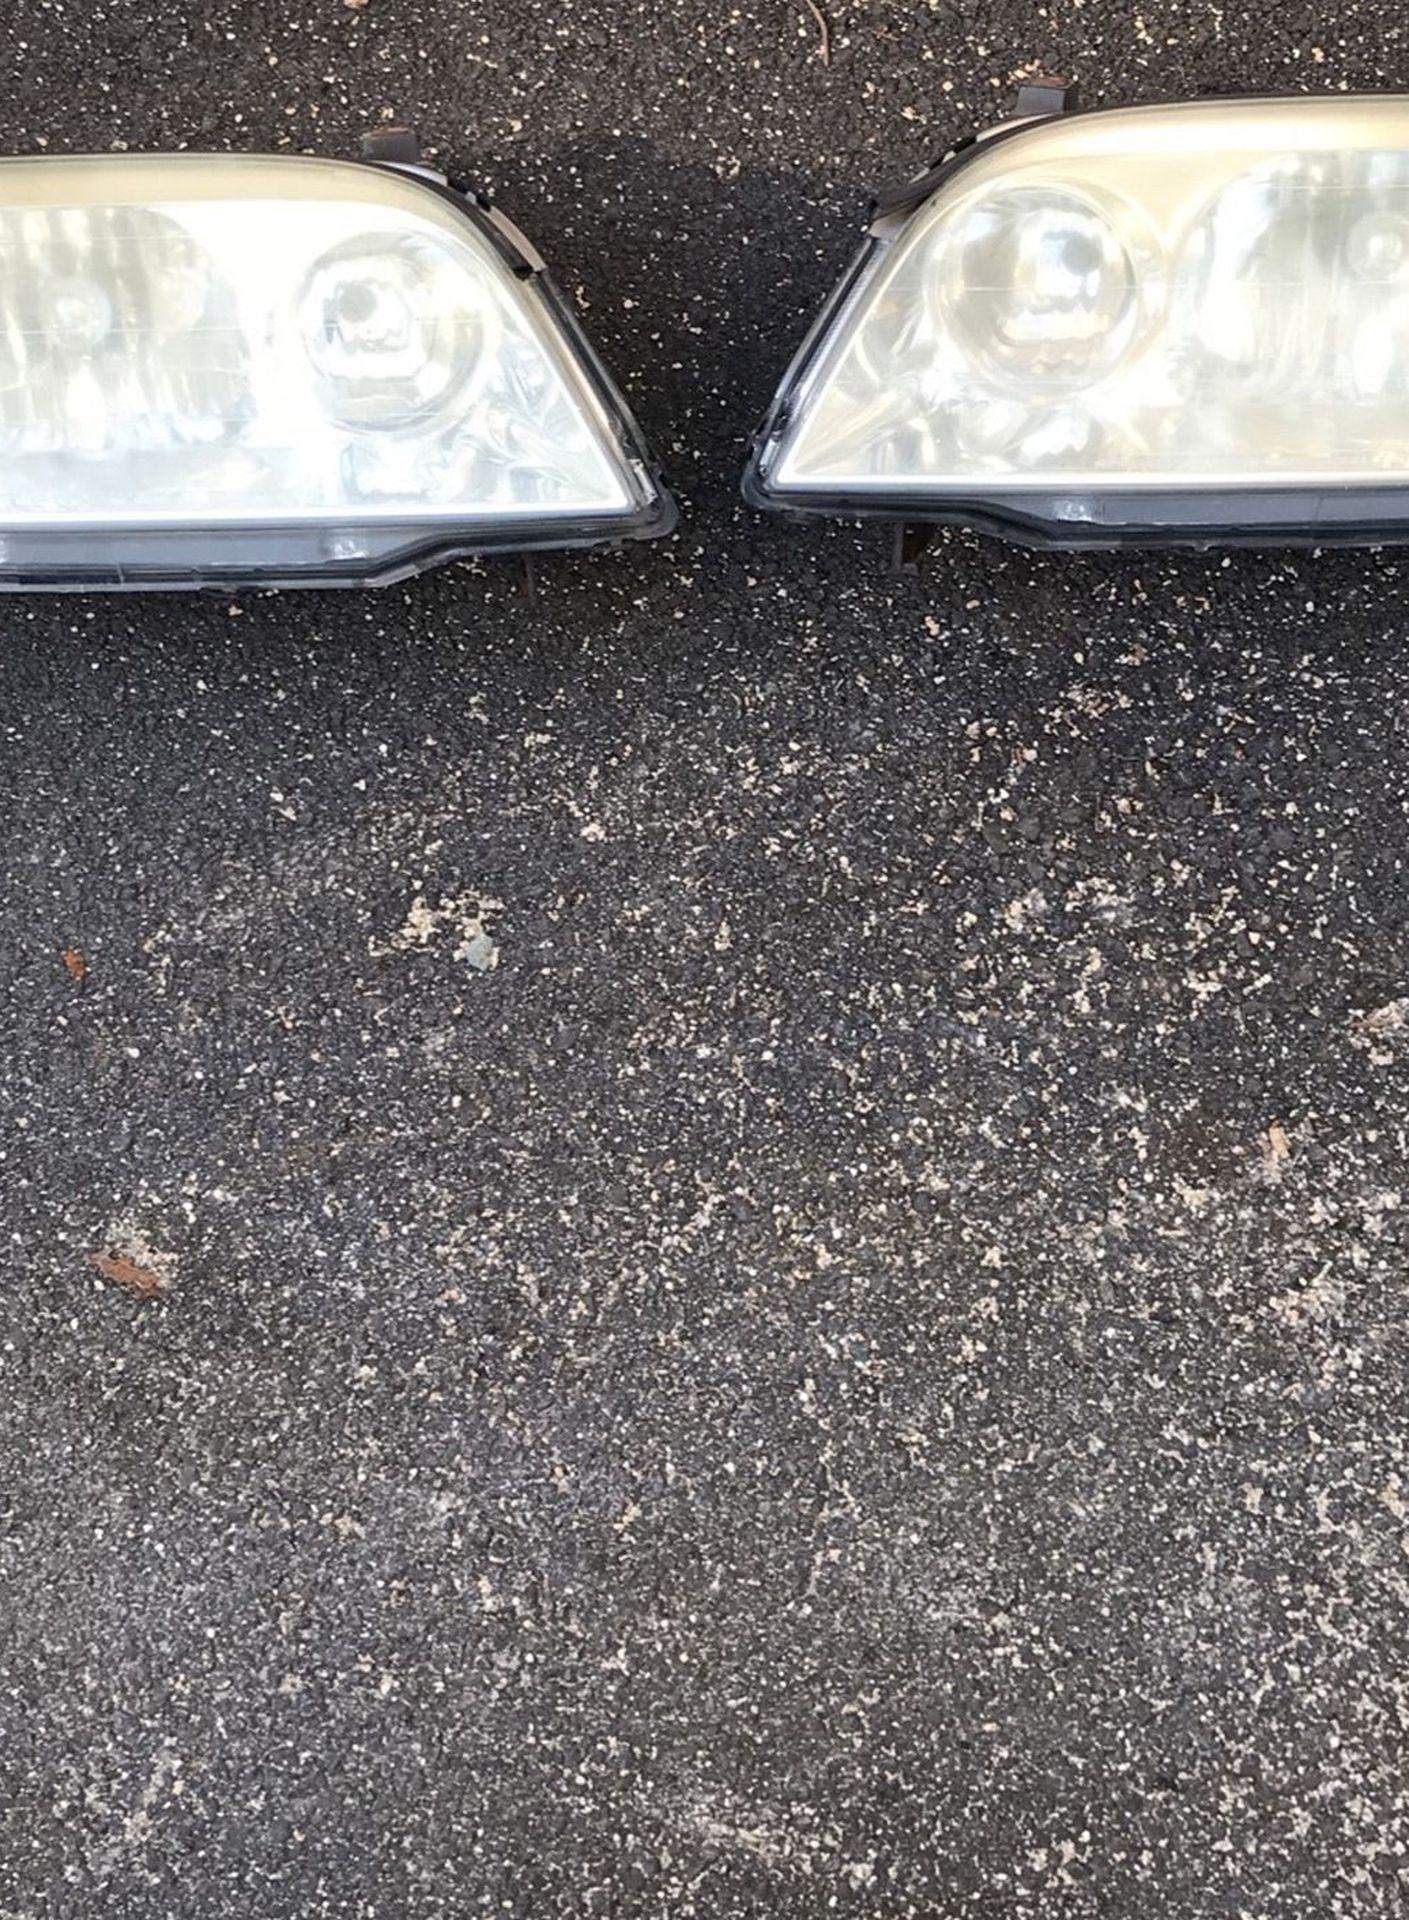 2003 Acura MDX Headlights